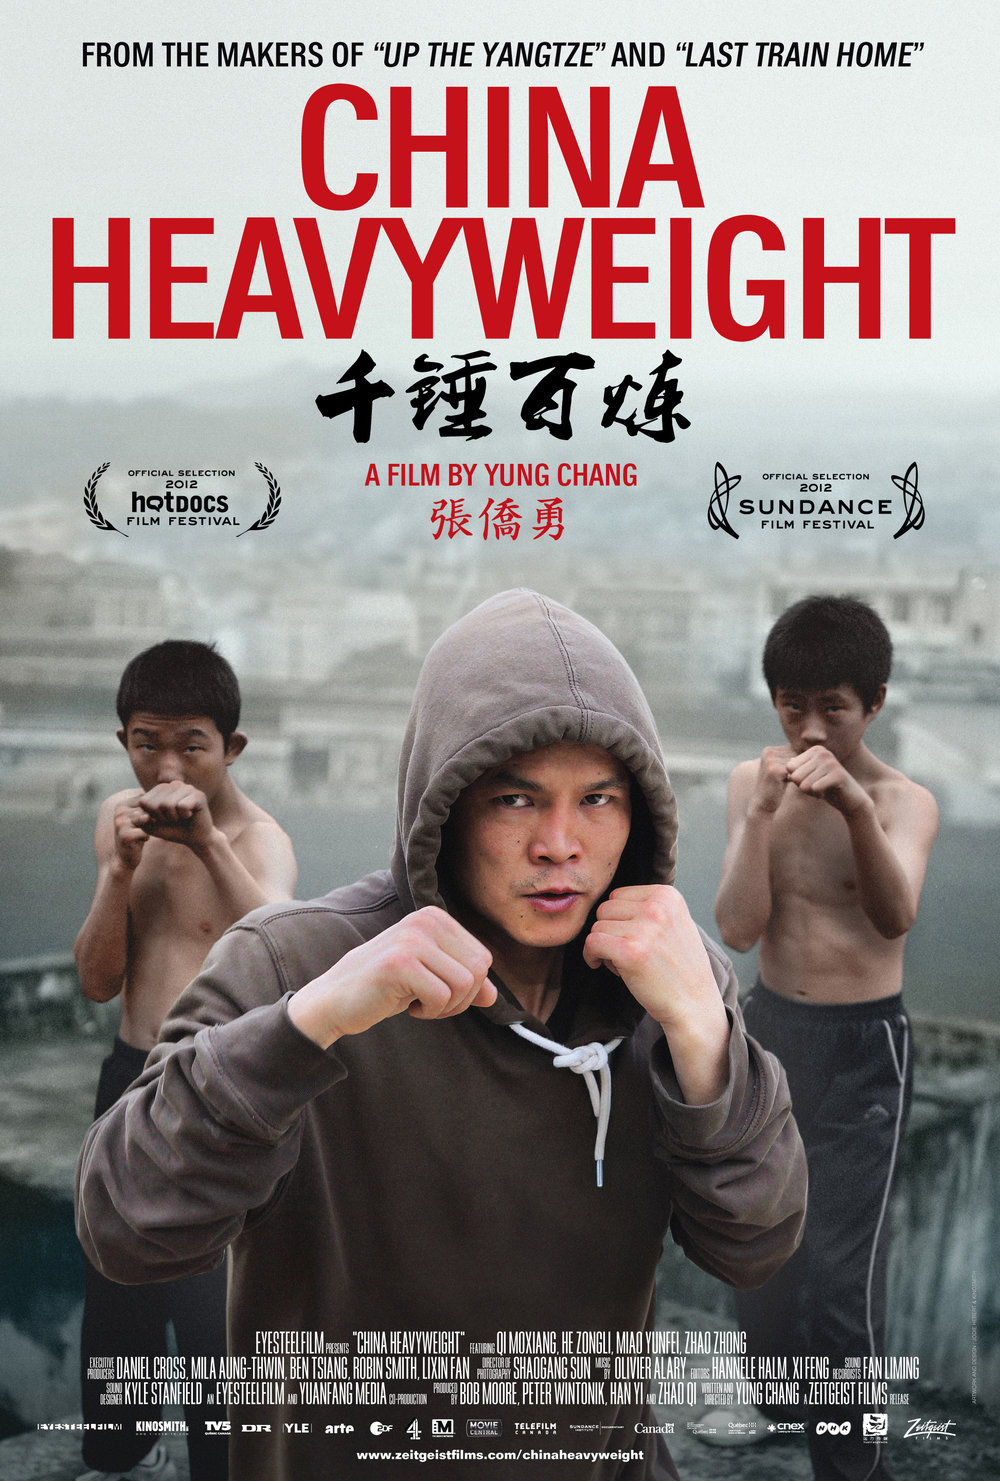 (Co-Editor) CHINA HEAVYWEIGHT (2012)